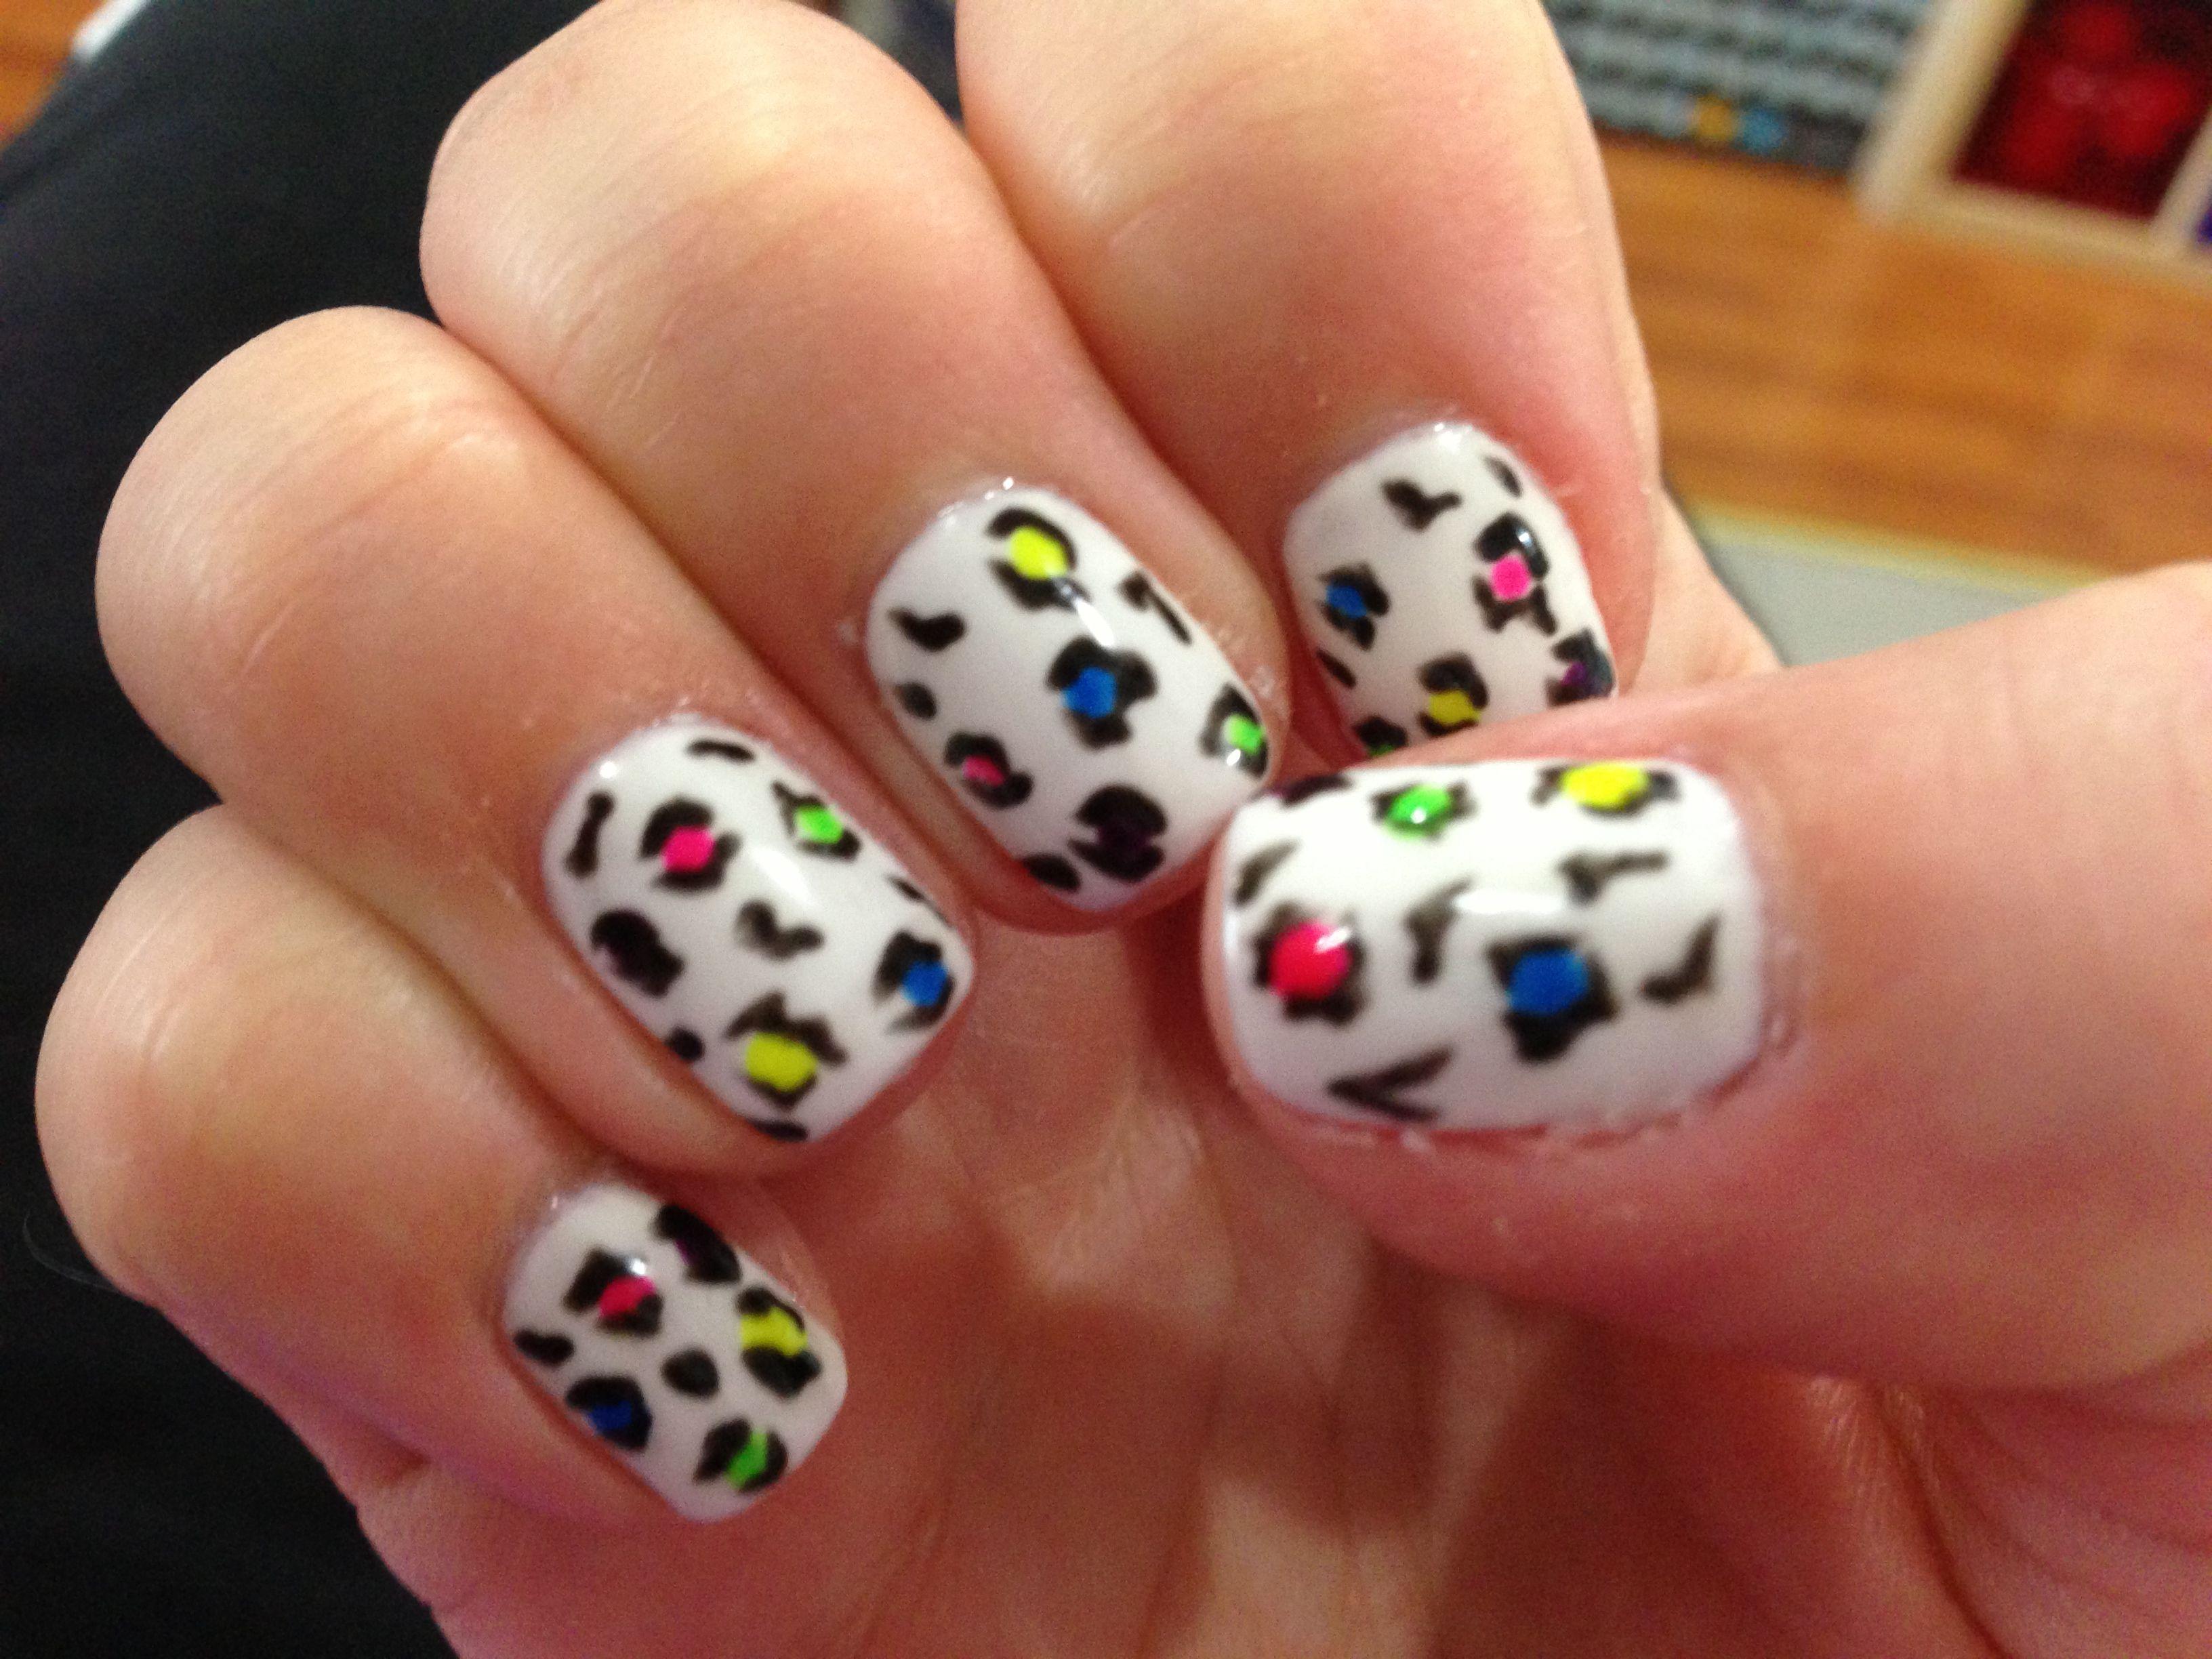 Neon Leopard Nail Art Nails Pinterest Leopard Nail Art